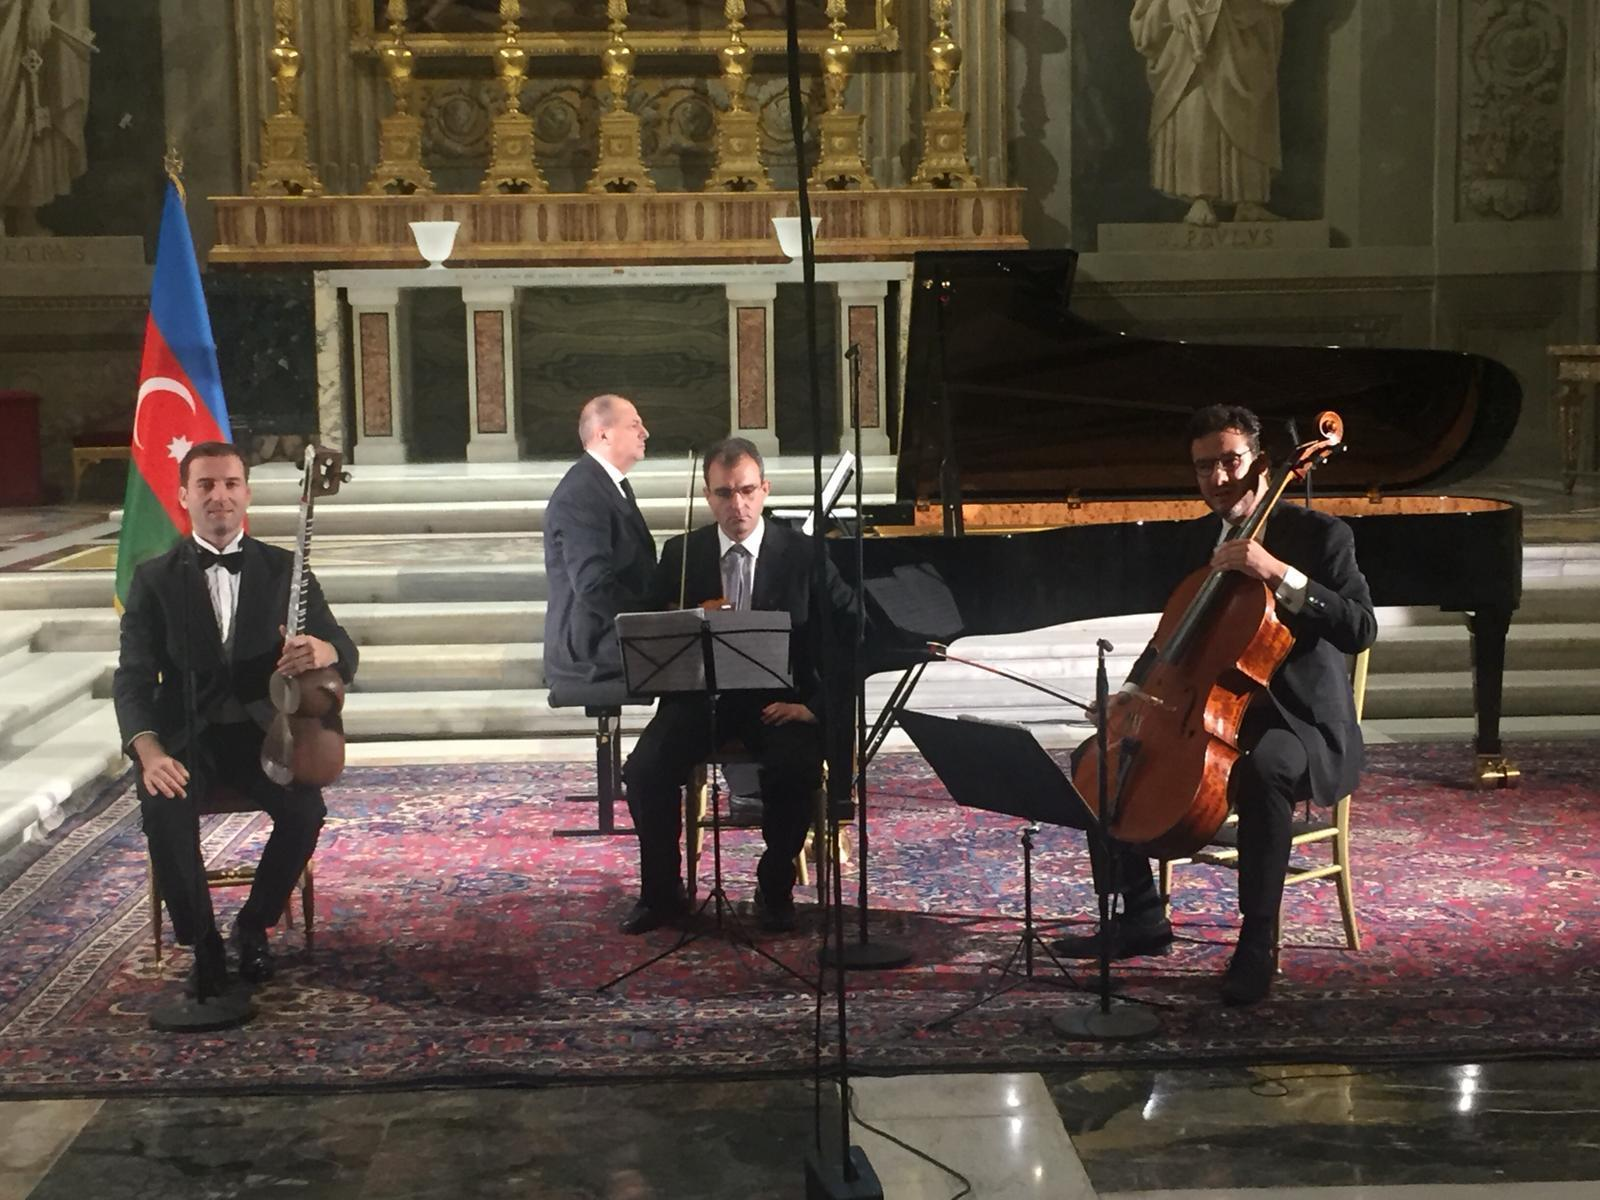 Concert of Azerbaijani music held at Italian President Palace